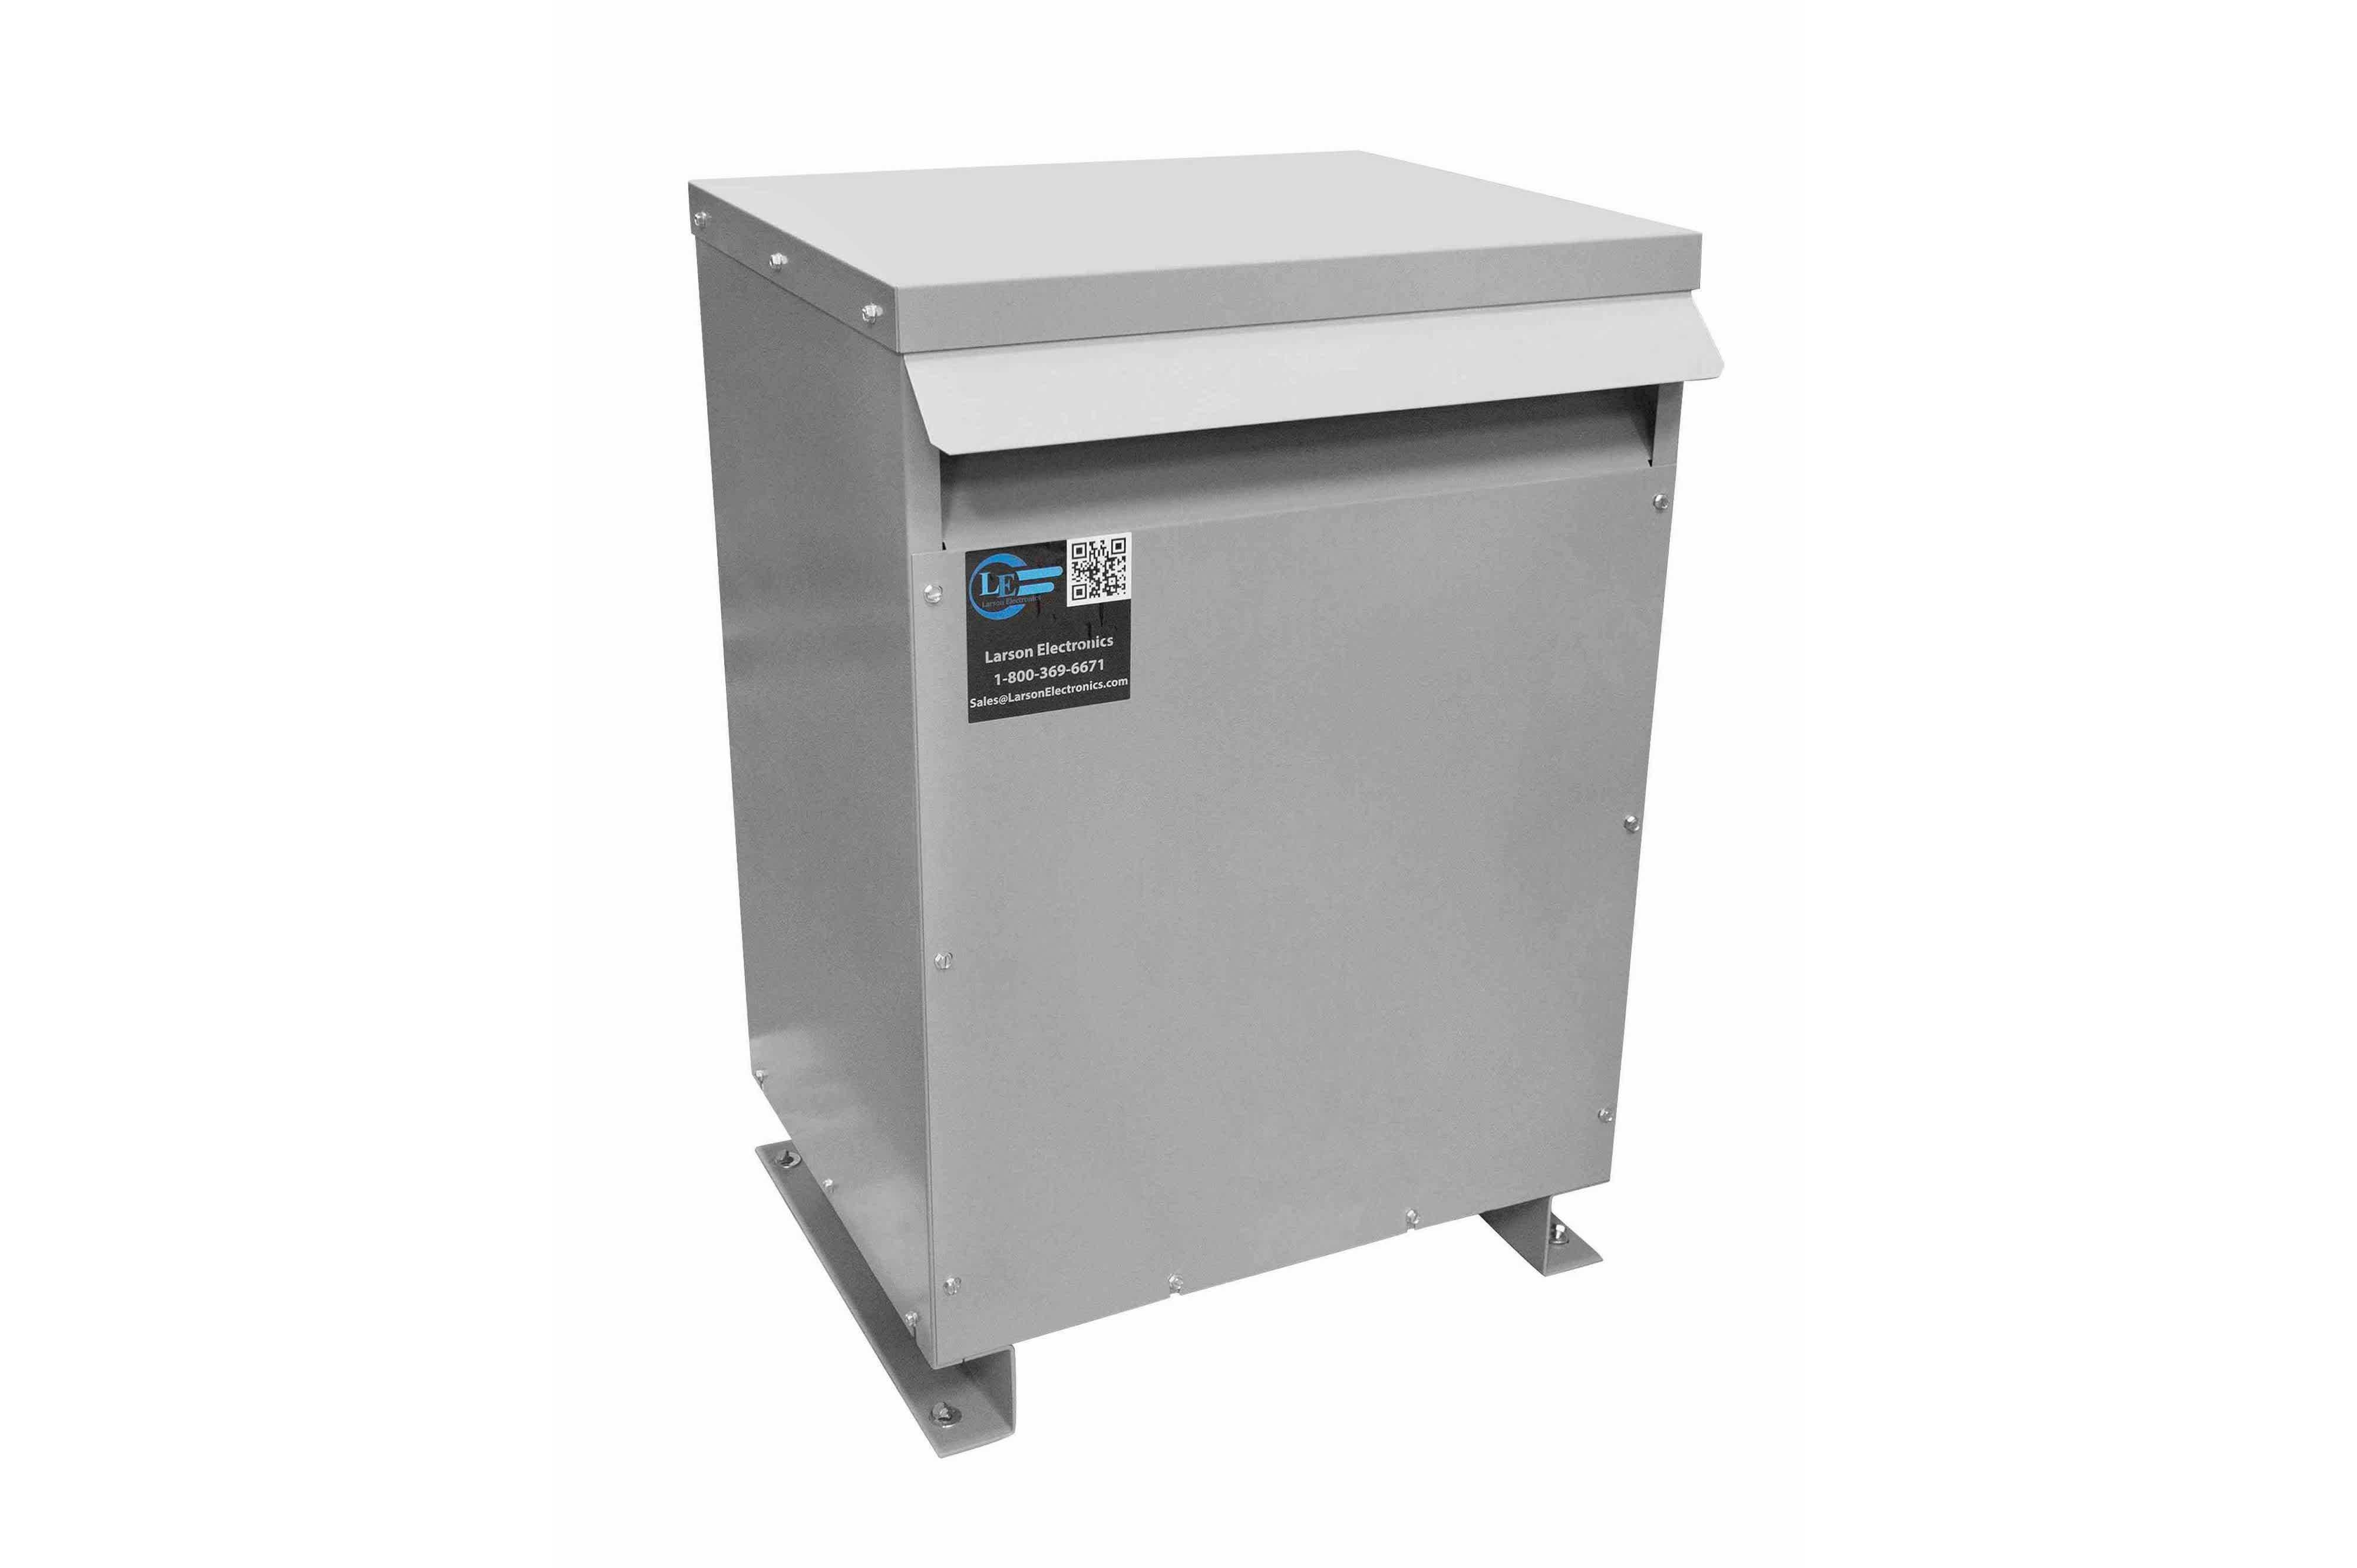 26 kVA 3PH Isolation Transformer, 220V Wye Primary, 480V Delta Secondary, N3R, Ventilated, 60 Hz